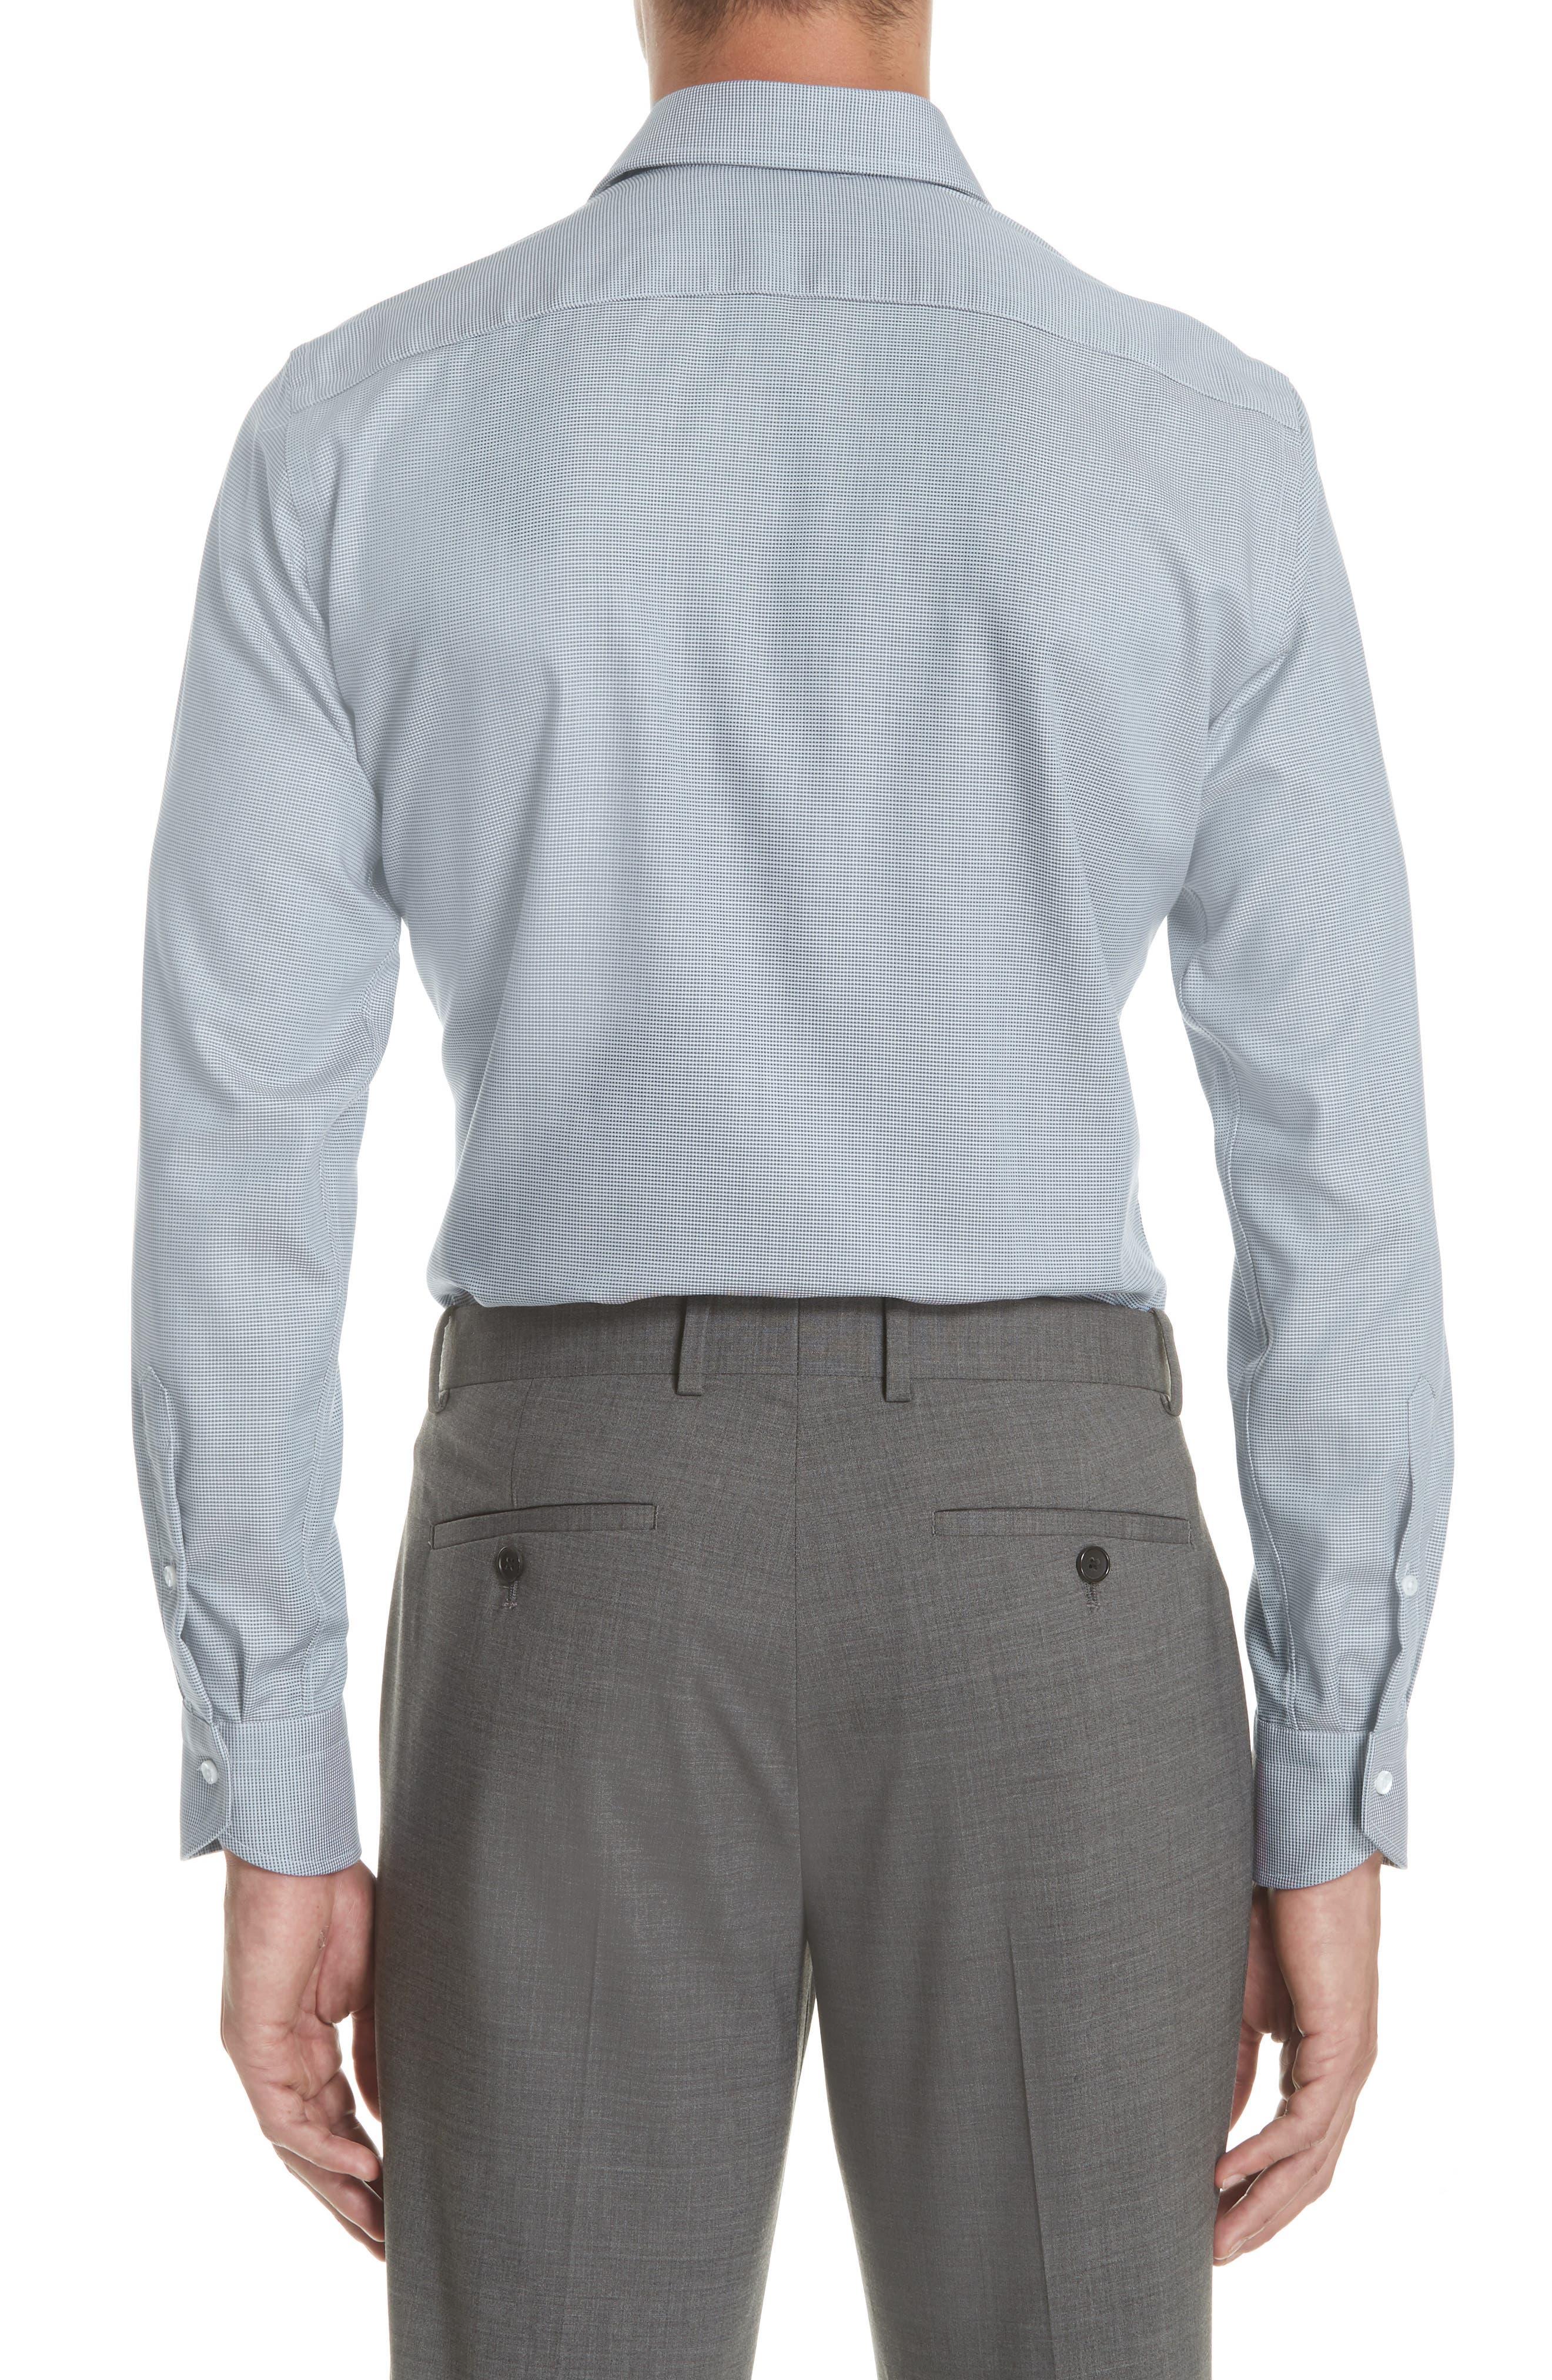 Regular Fit Solid Dress Shirt,                             Alternate thumbnail 3, color,                             200